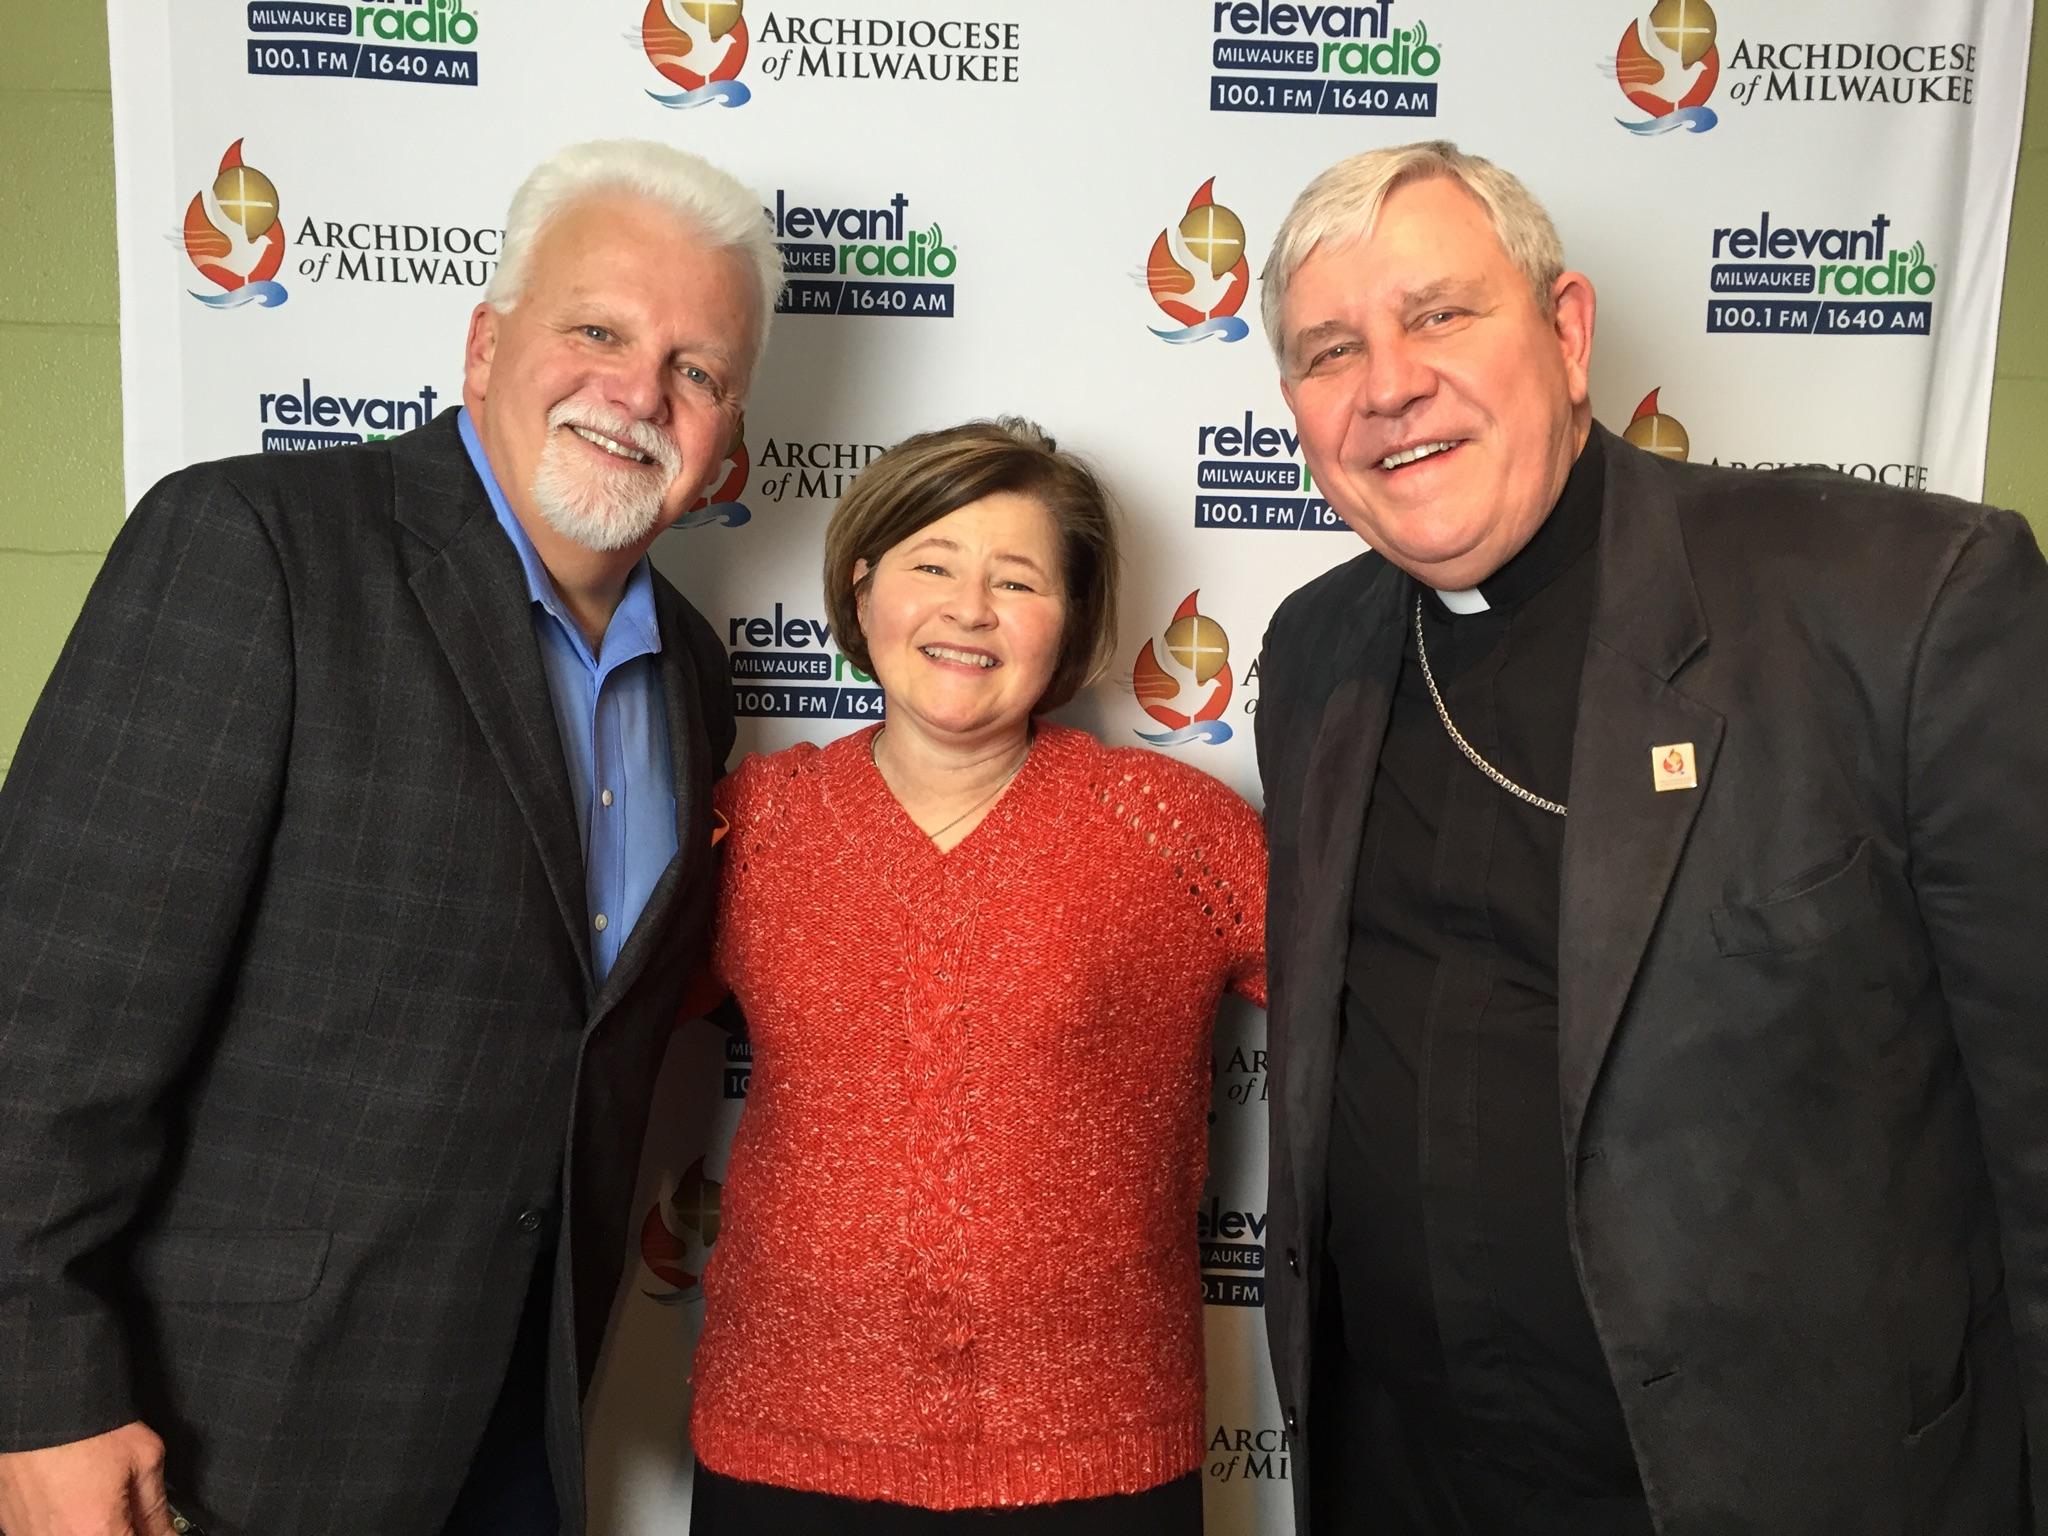 Popular Catholic Radio & TV Personality